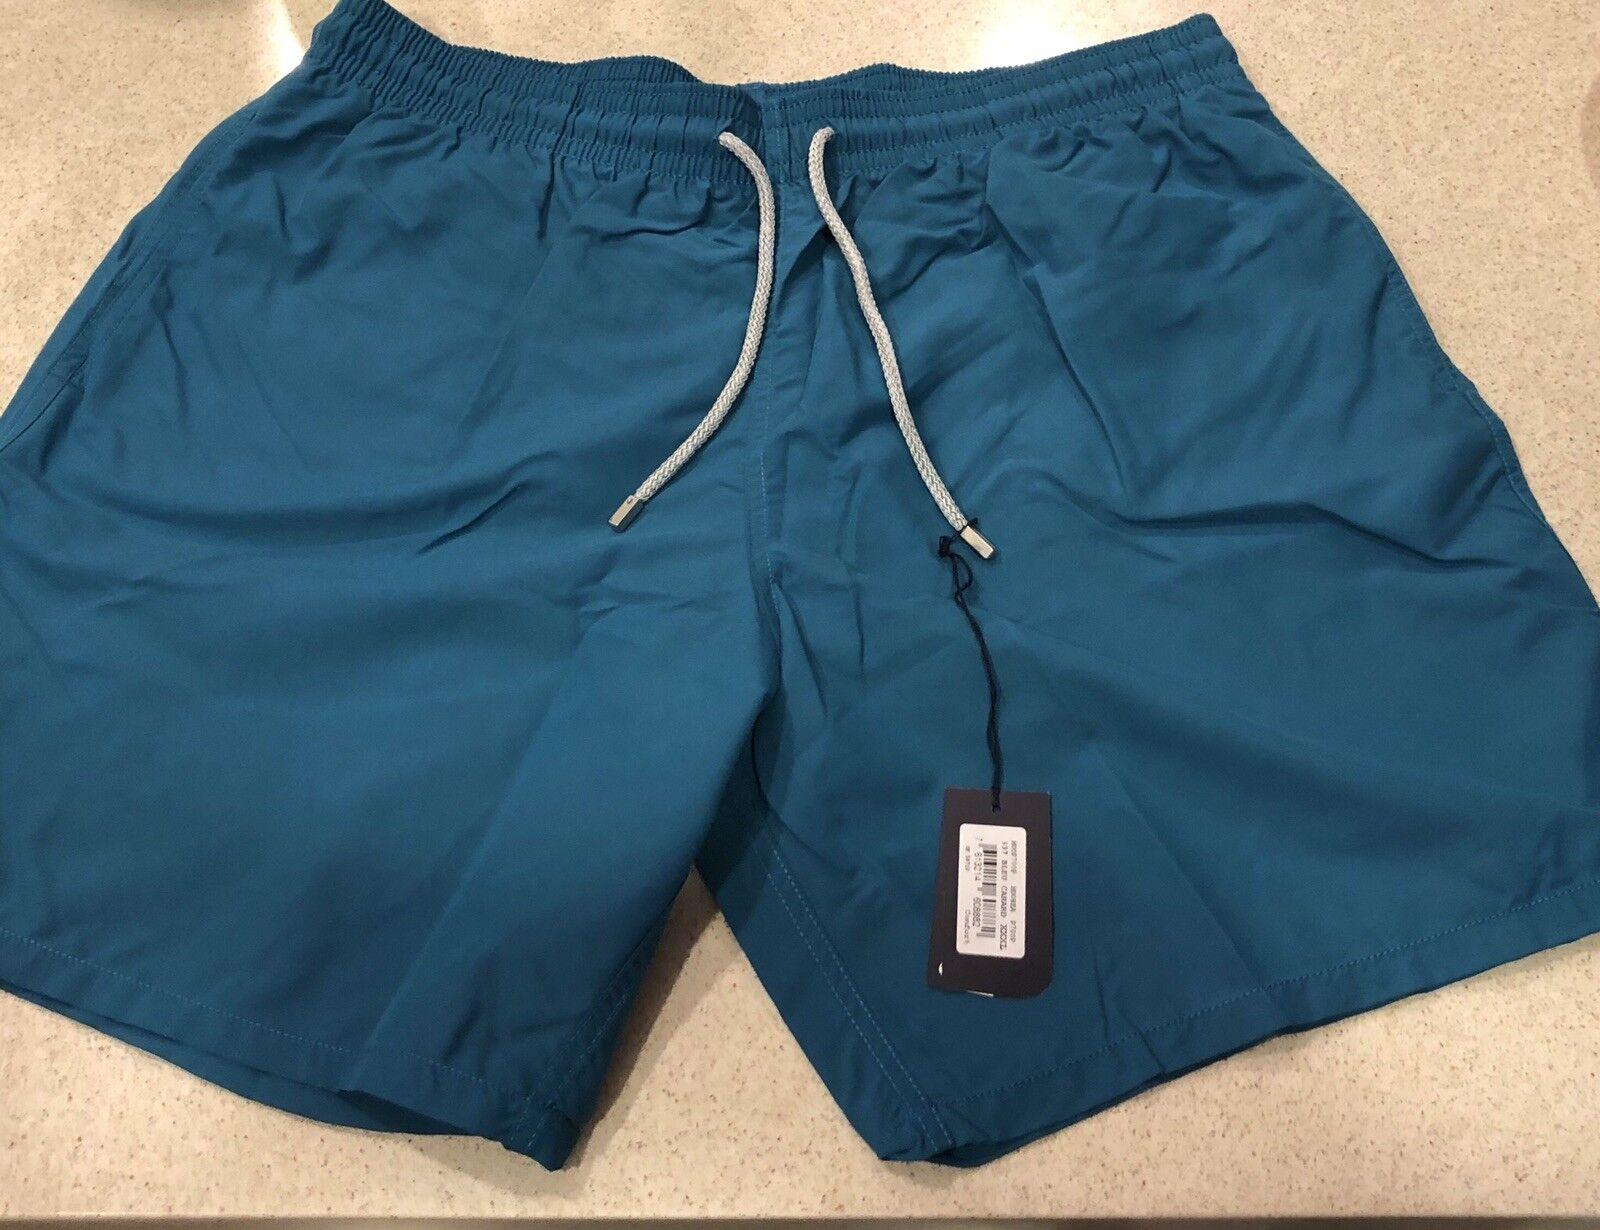 New w Tags Authentic Vilebrequin MOOREA bluee Swim Trunks for Men XXXL 3XL